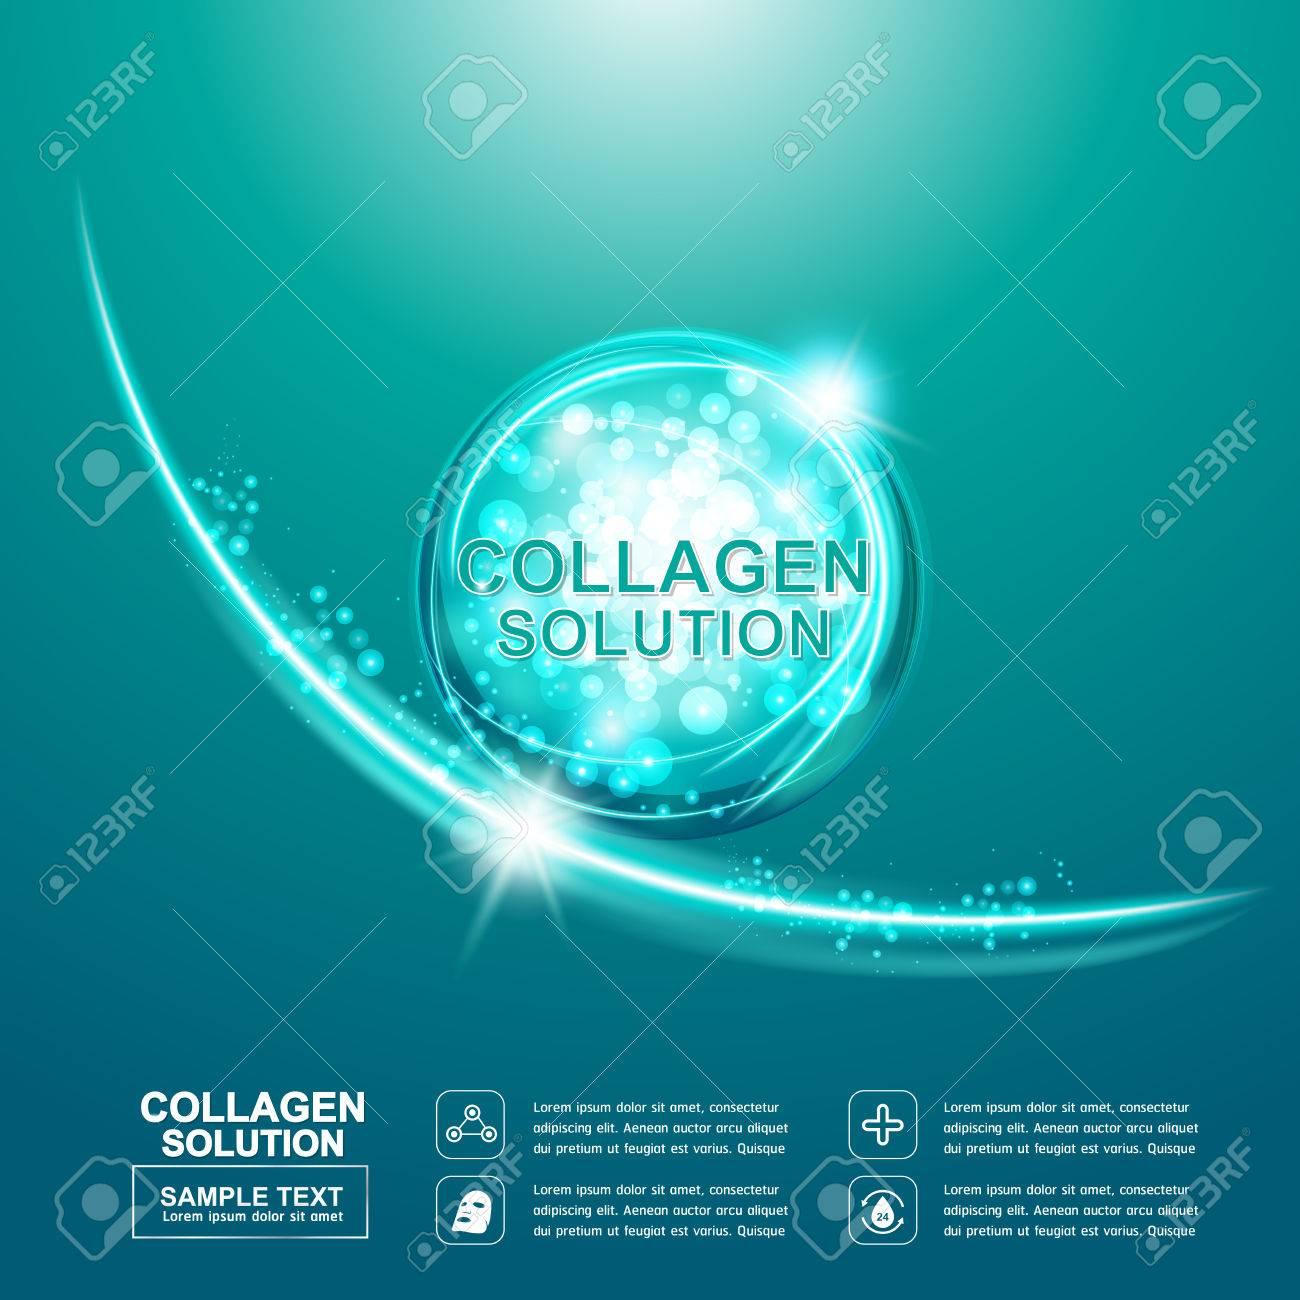 http://n3.datasn.io/data/api/v1/n3zm/image_of_skin_disease_5/by_table/skin_disease_image_download_access/a4/79/f7/e9/a479f7e99ea287cf1bc264f1dee3a44012617af7.jpg